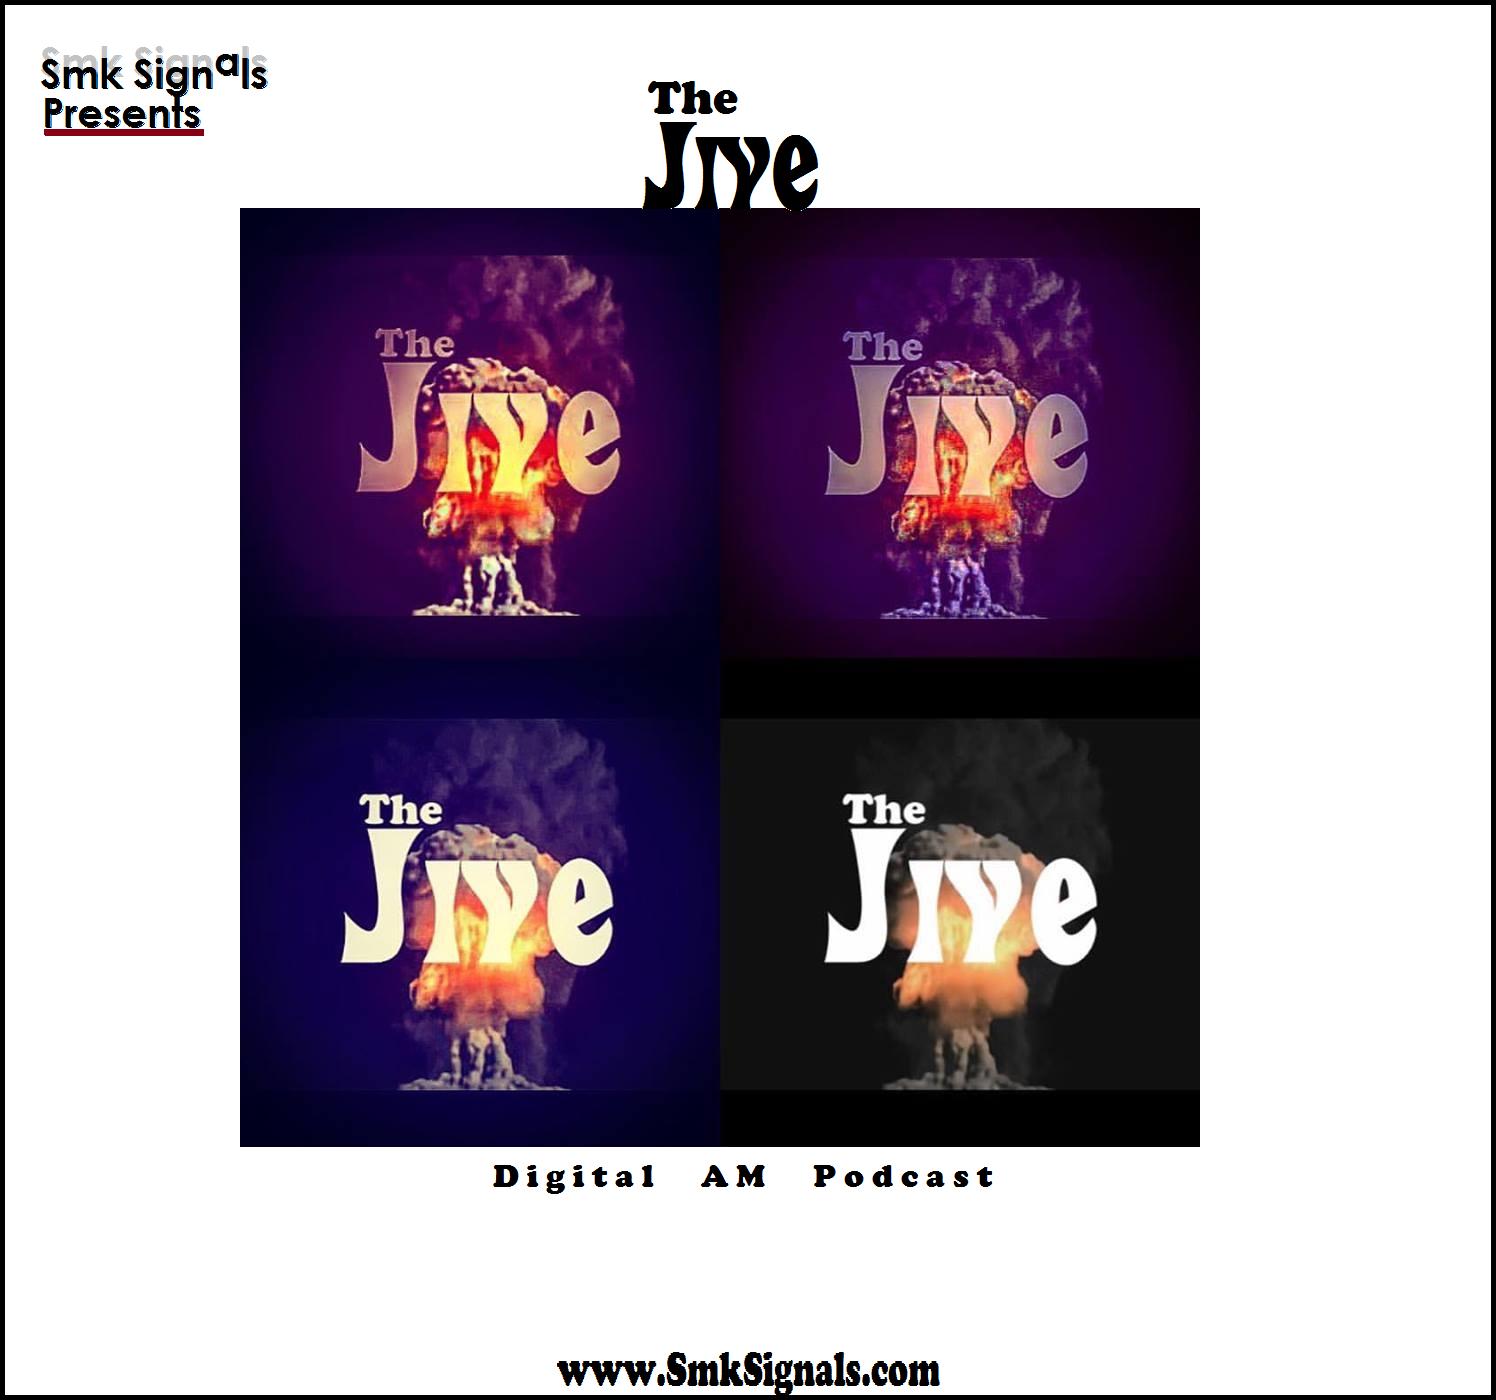 the jive pod logo 2.png